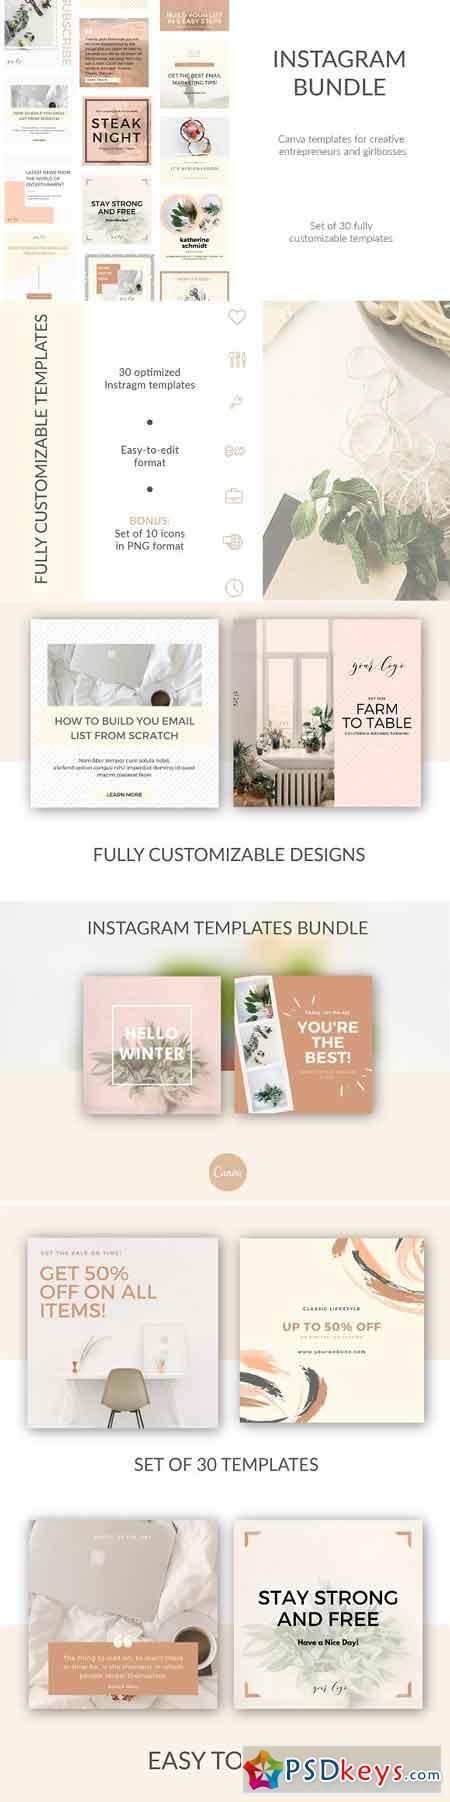 30 Instagram Canva DIY Templates 2977440